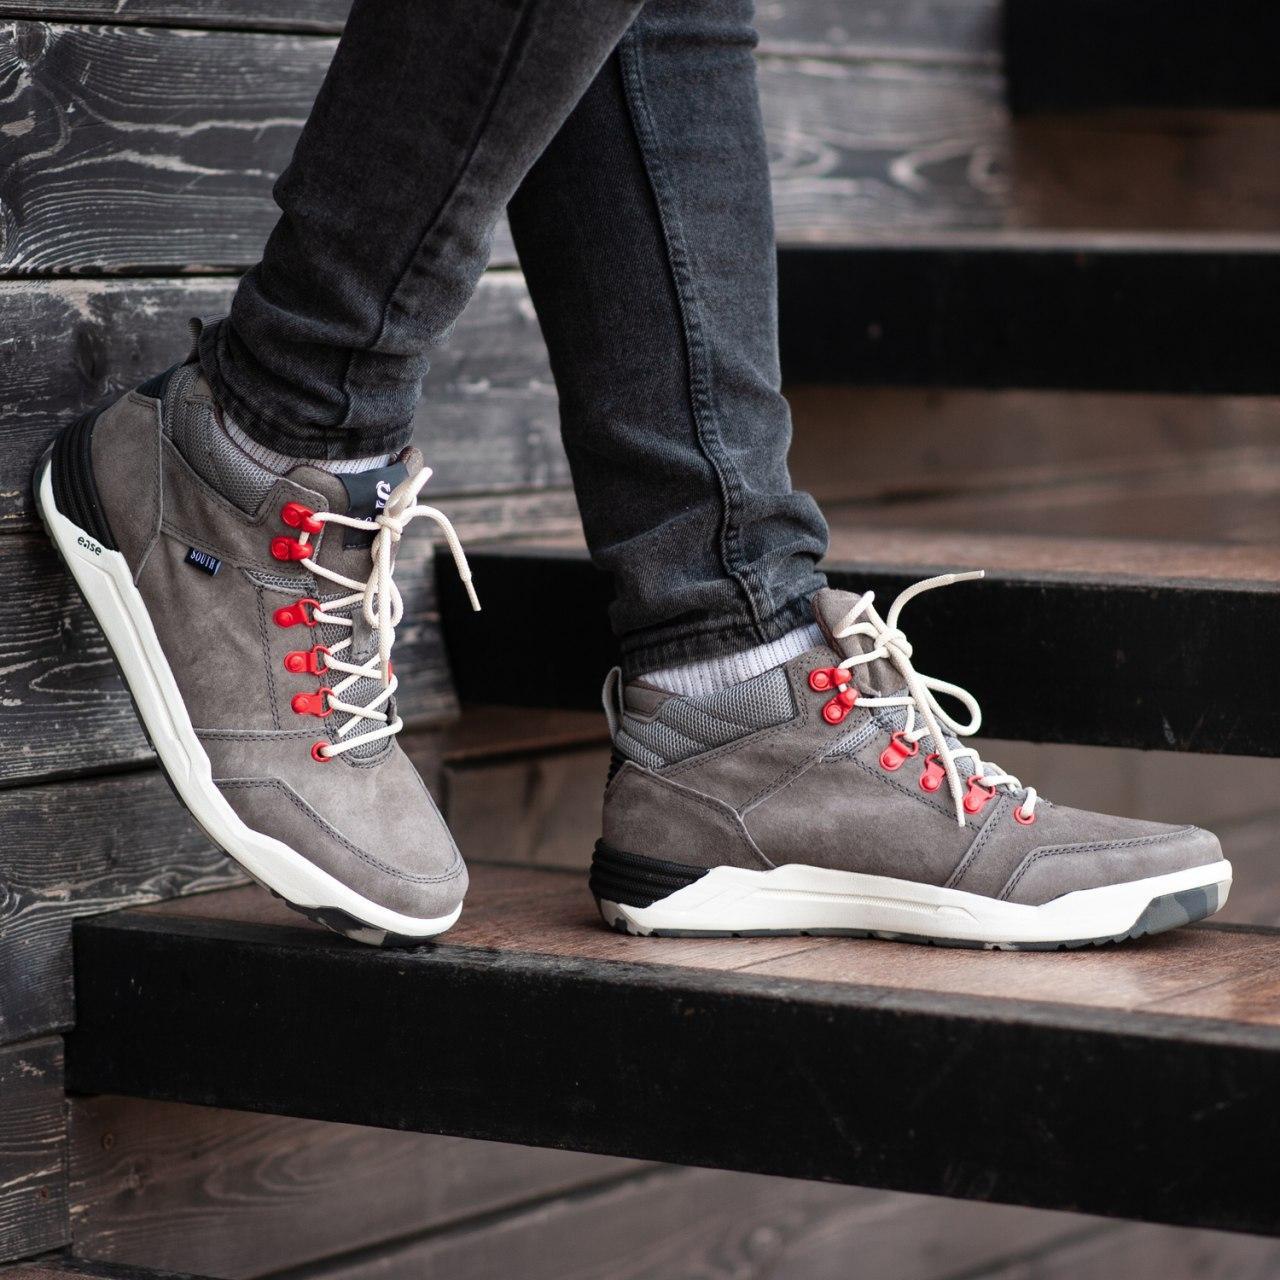 Ботинки South fenix grey